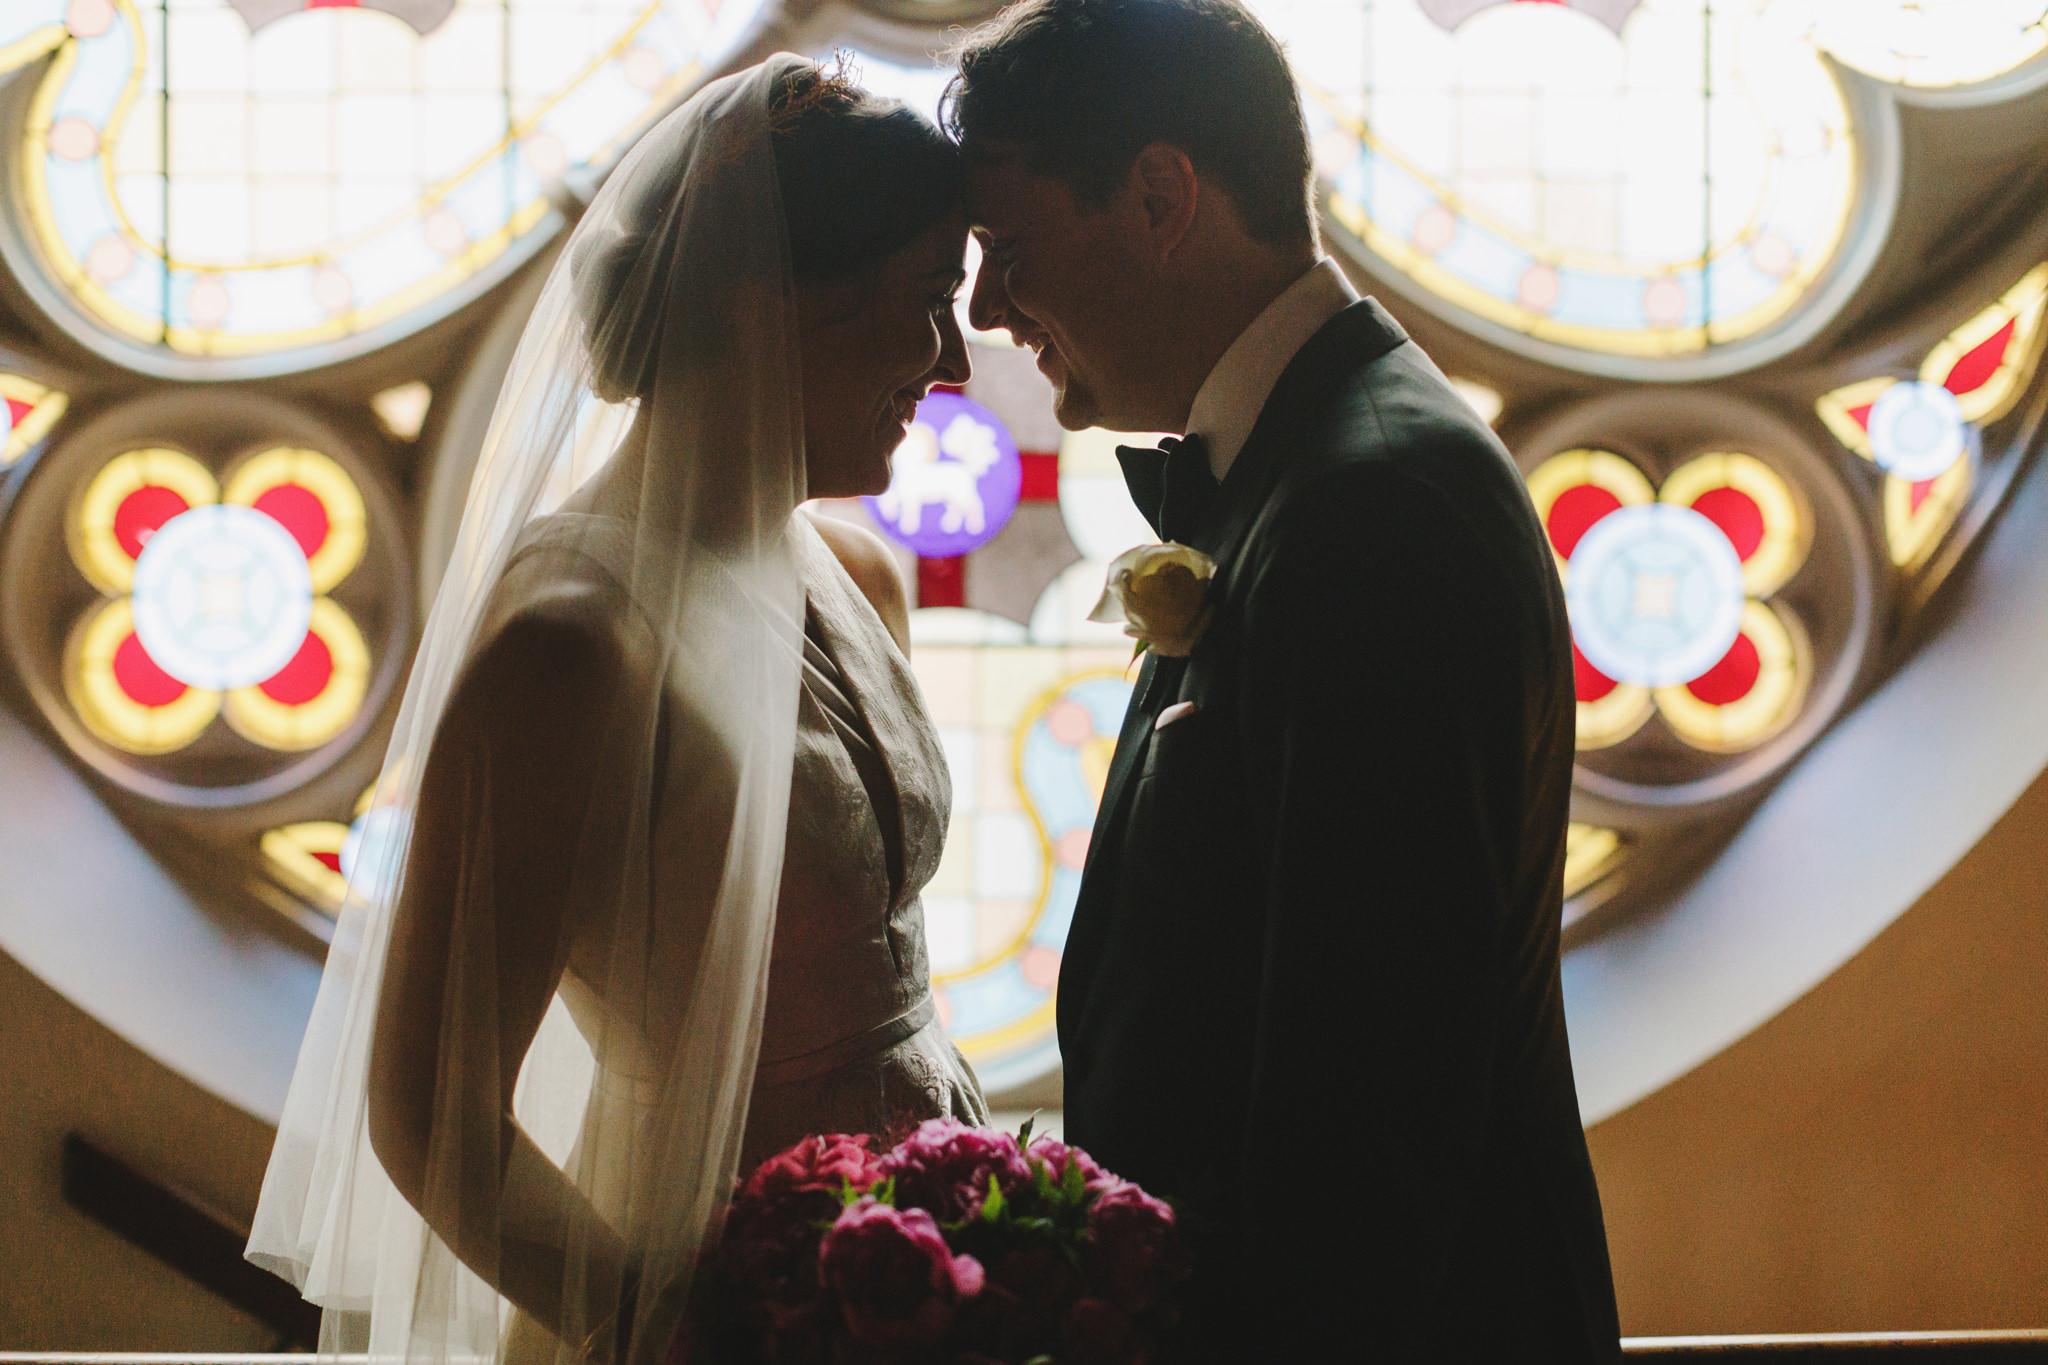 Abbotsford_Convent_Wedding_Peter_Anna075.JPG